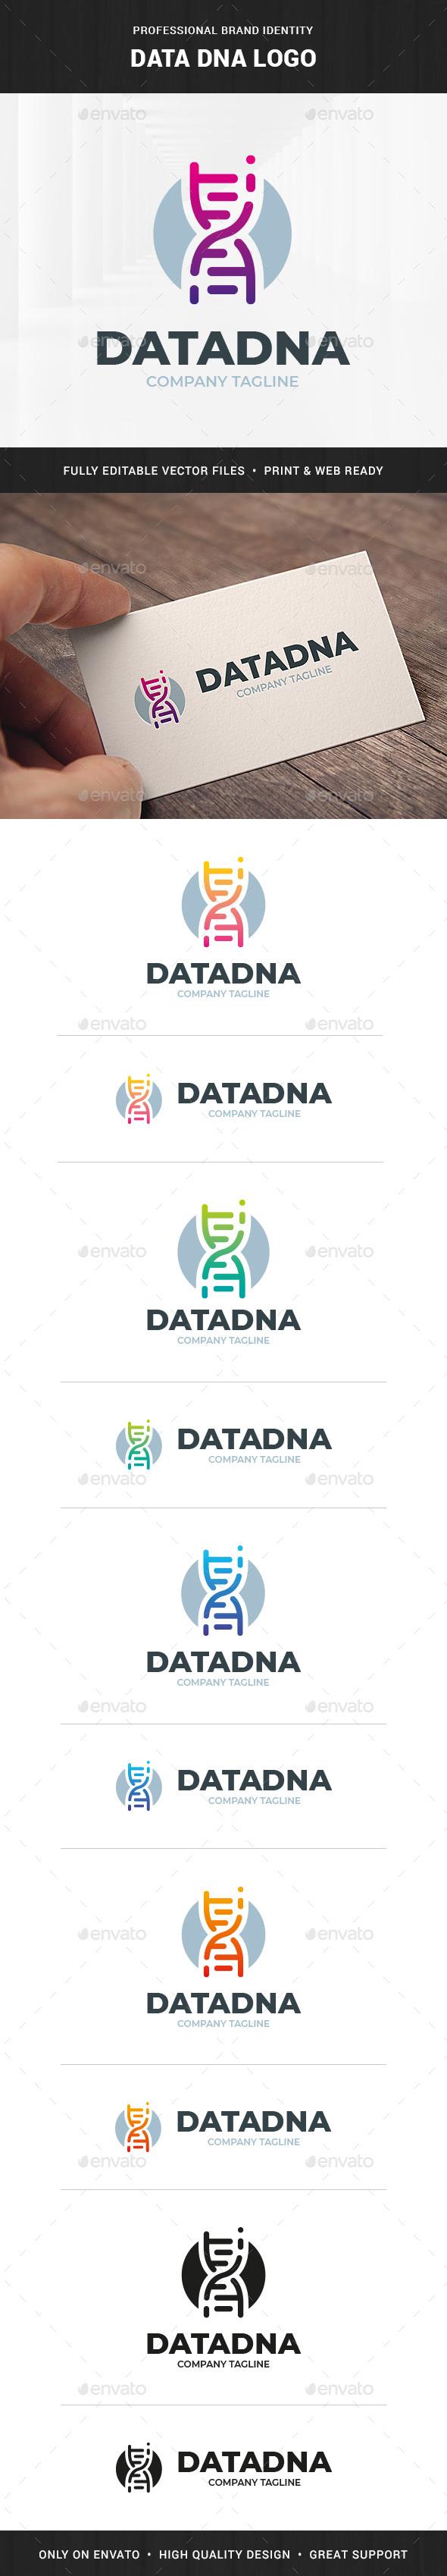 Data DNA Logo Template